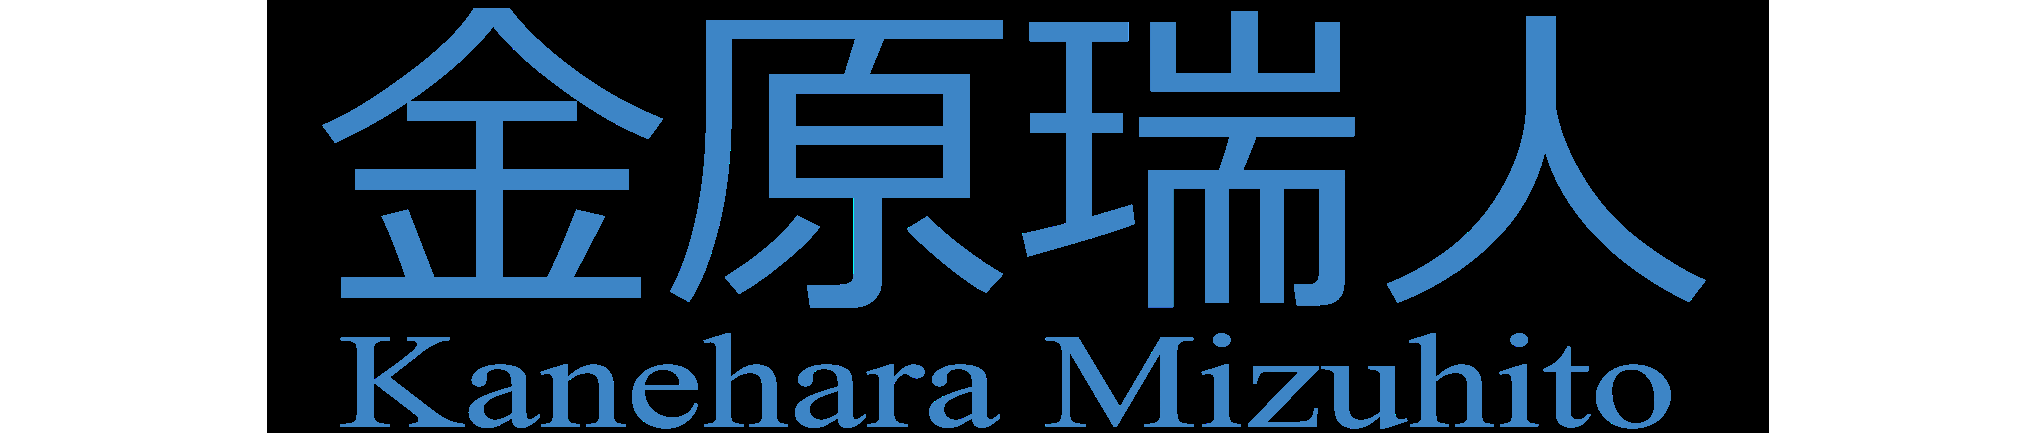 Mizuhito Kanehara